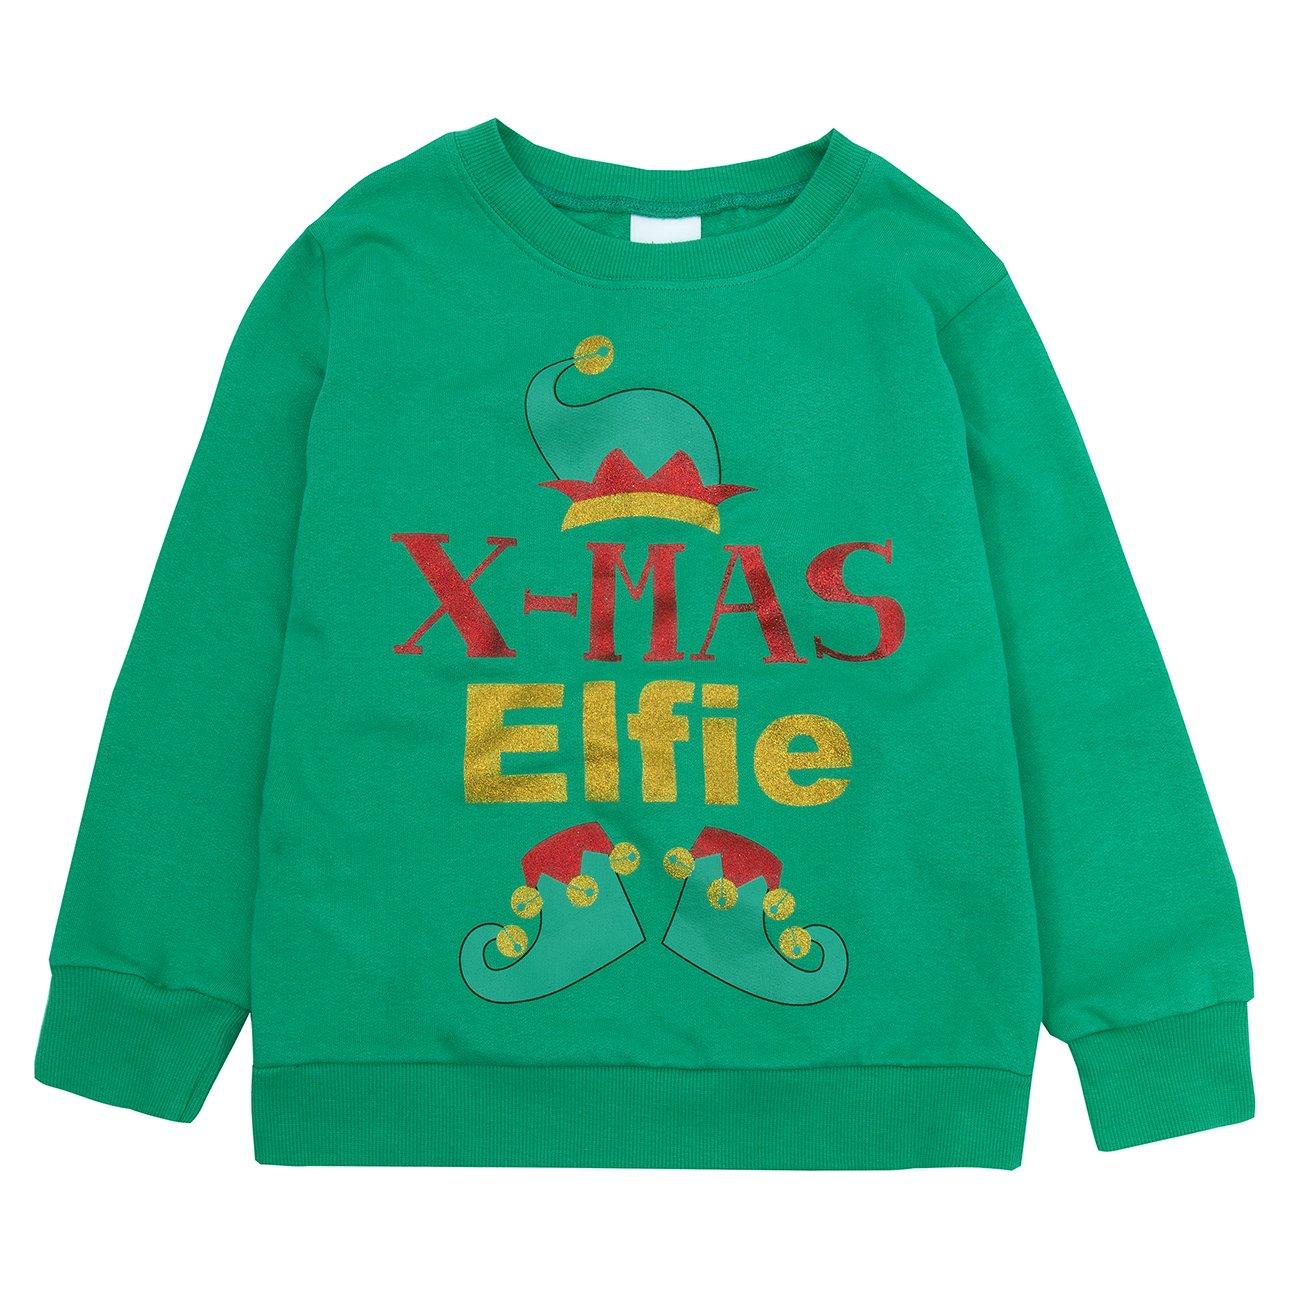 Childrens Christmas Jumper Long Sleeved Top